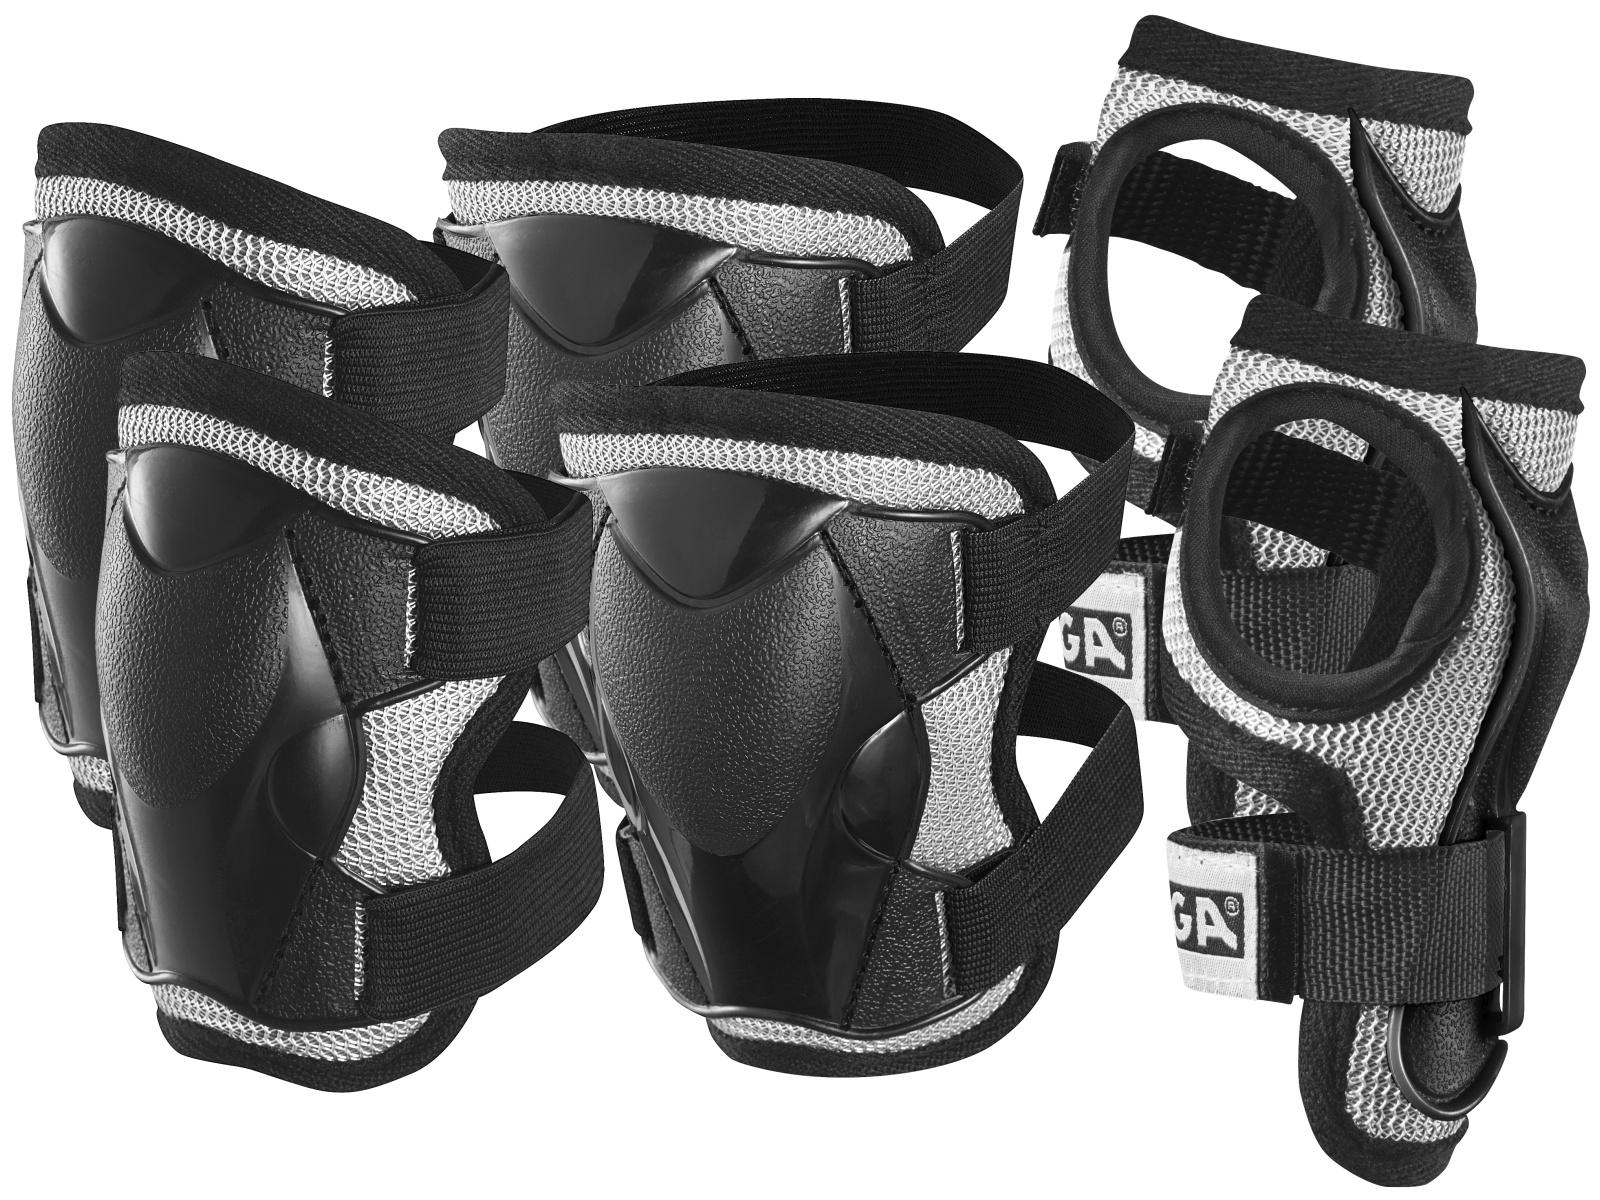 Chrániče STIGA Comfort Junior černé - vel. XS